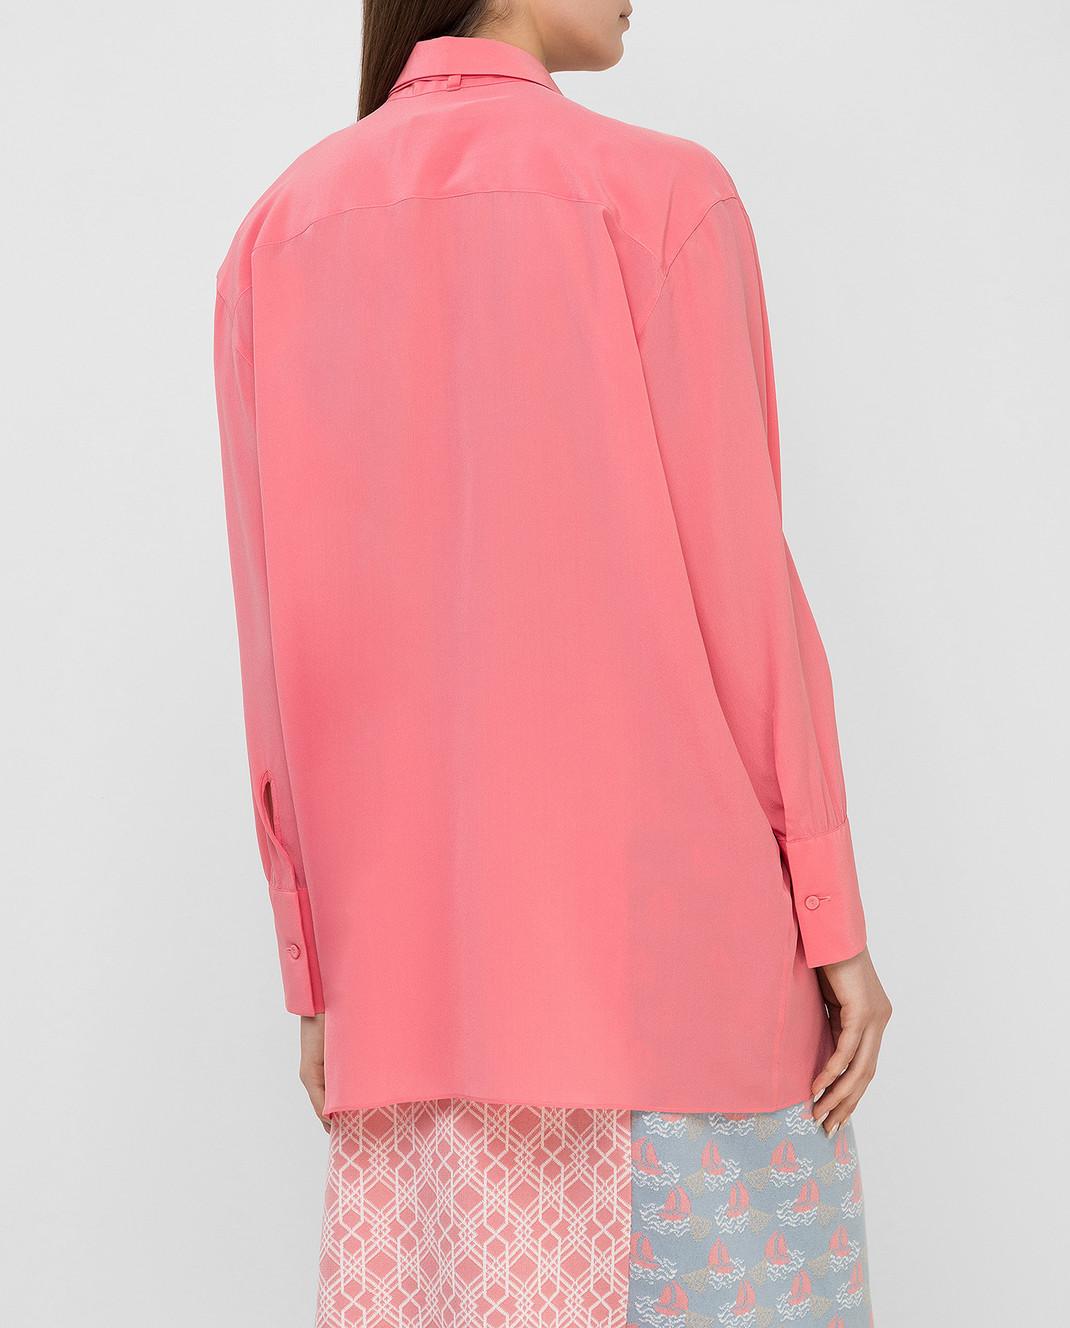 Valentino Коралловая блуза из шелка MB0AB08F21B изображение 4